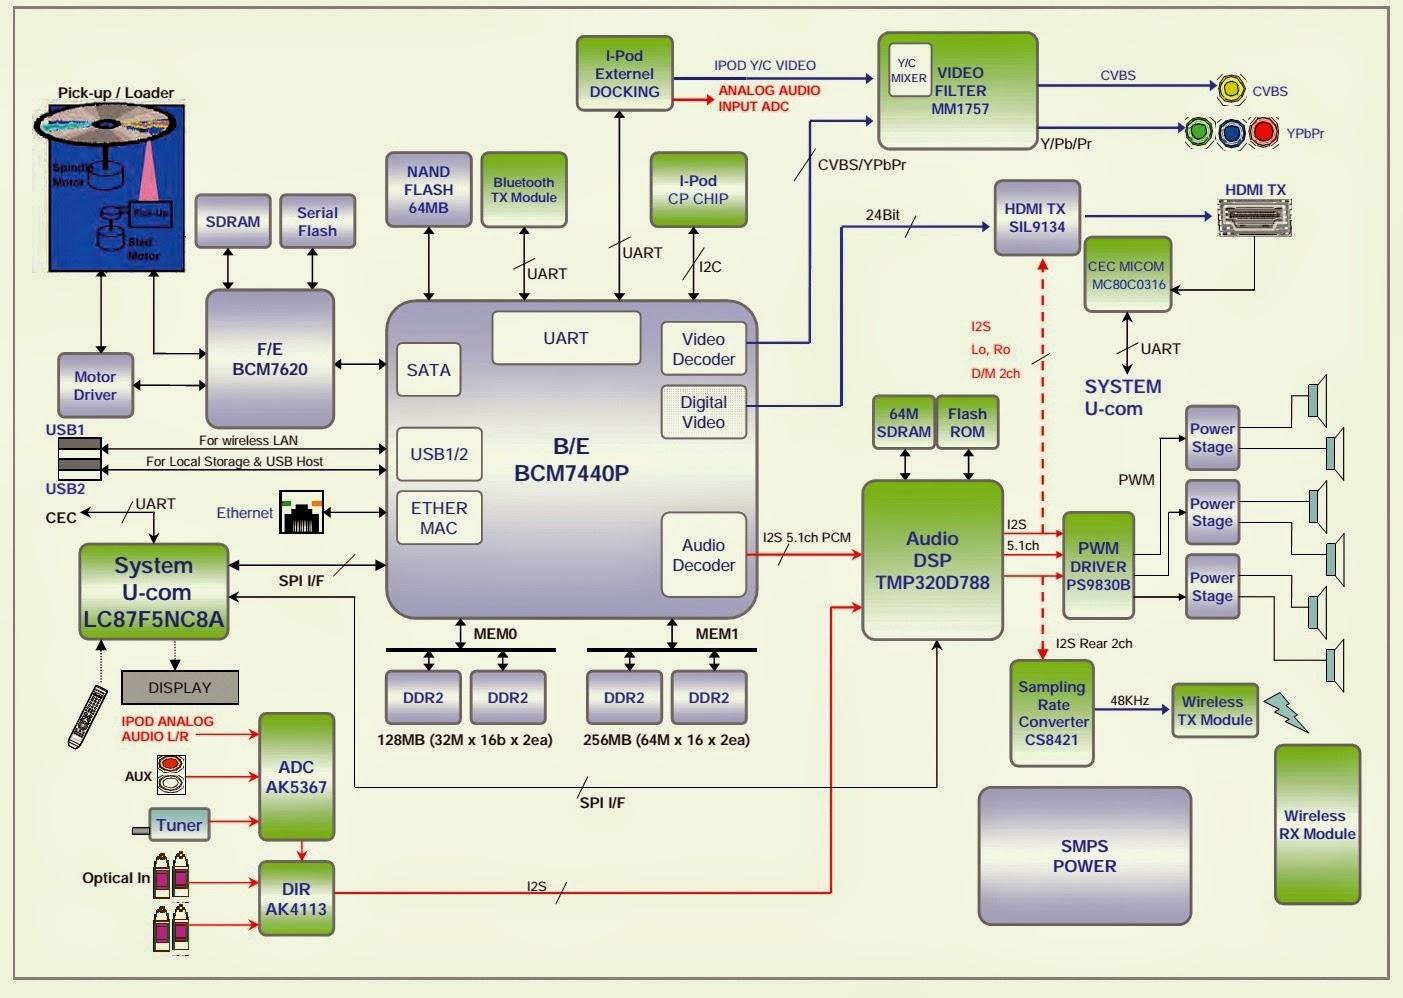 ELECTRONIC EQUIPMENT REPAIR CENTRE : SAMSUNG HTBD1255